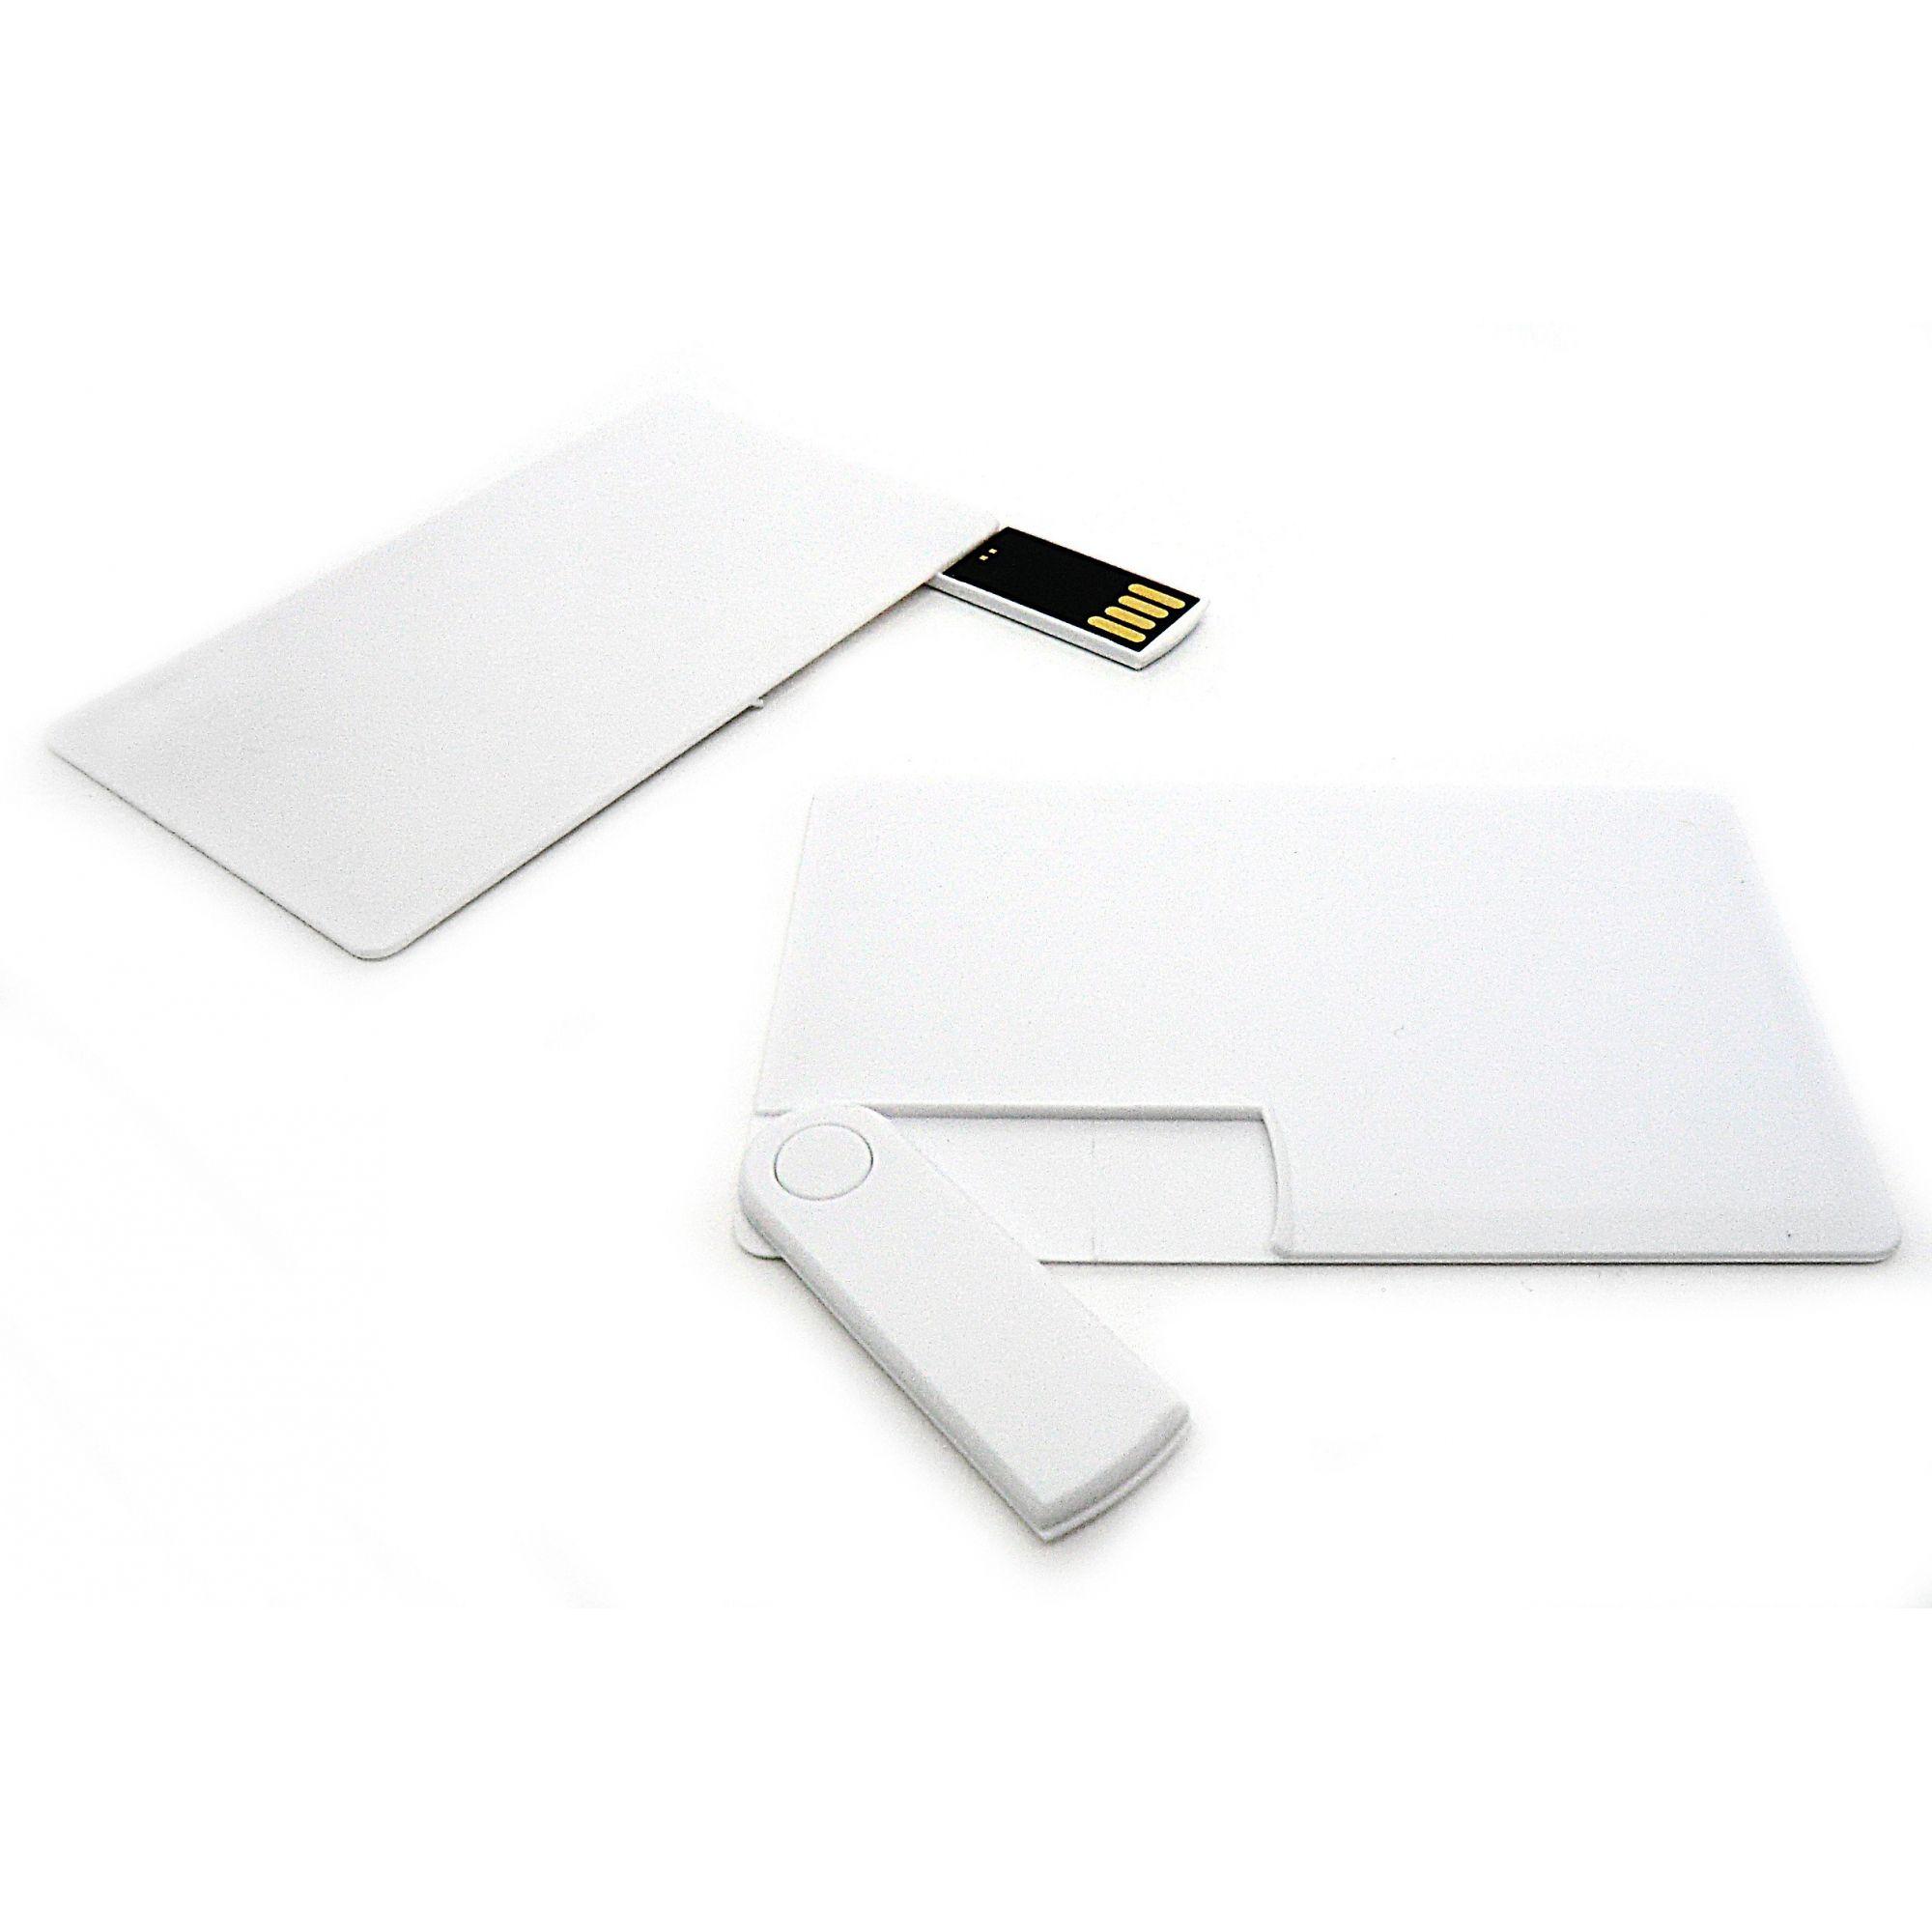 Pen Card 32GB Plástico Branco Retangular Canivete Personalizado